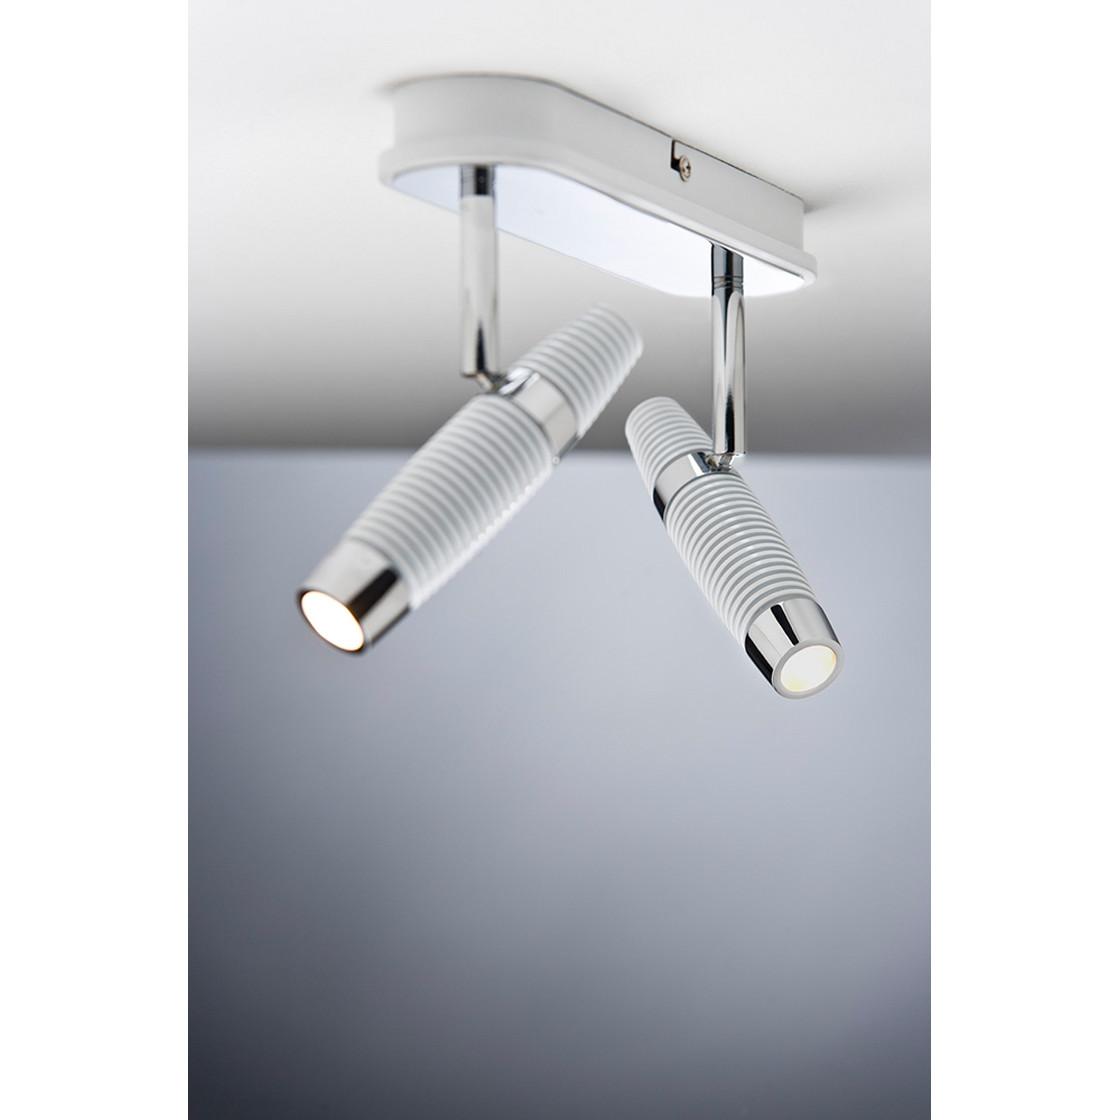 paulmann channel strahler led 2x10w wei chrom inkl leuchtmit 29 95. Black Bedroom Furniture Sets. Home Design Ideas